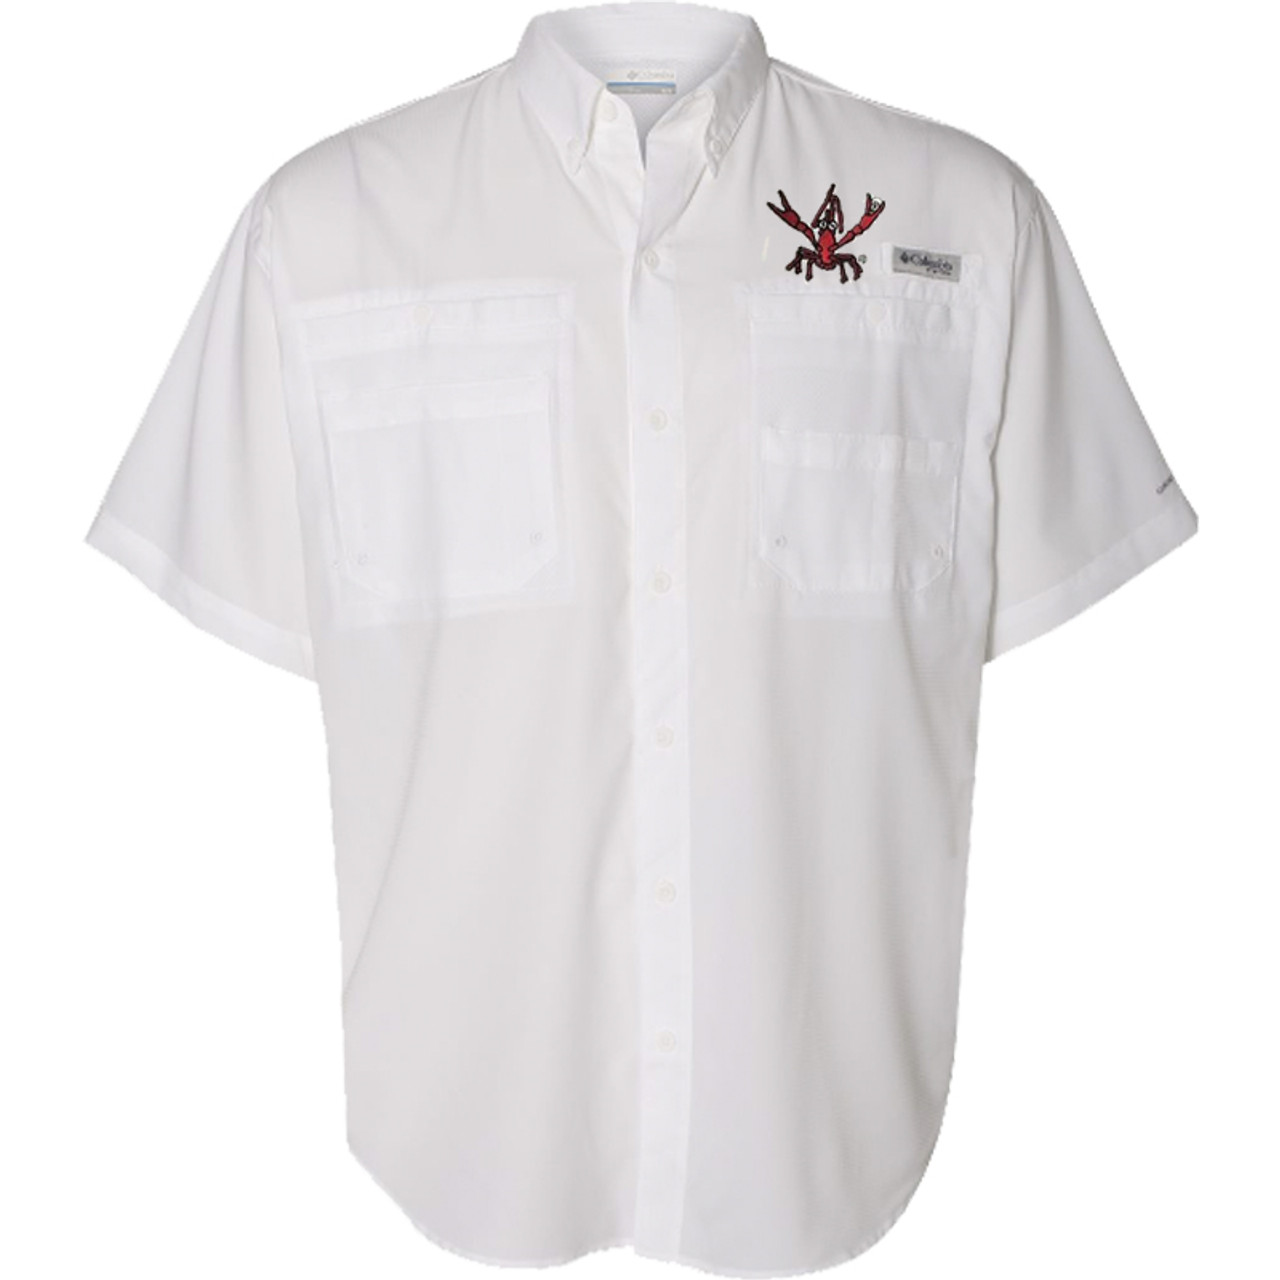 a32efe4f Crawfish Fishing Shirt (white)